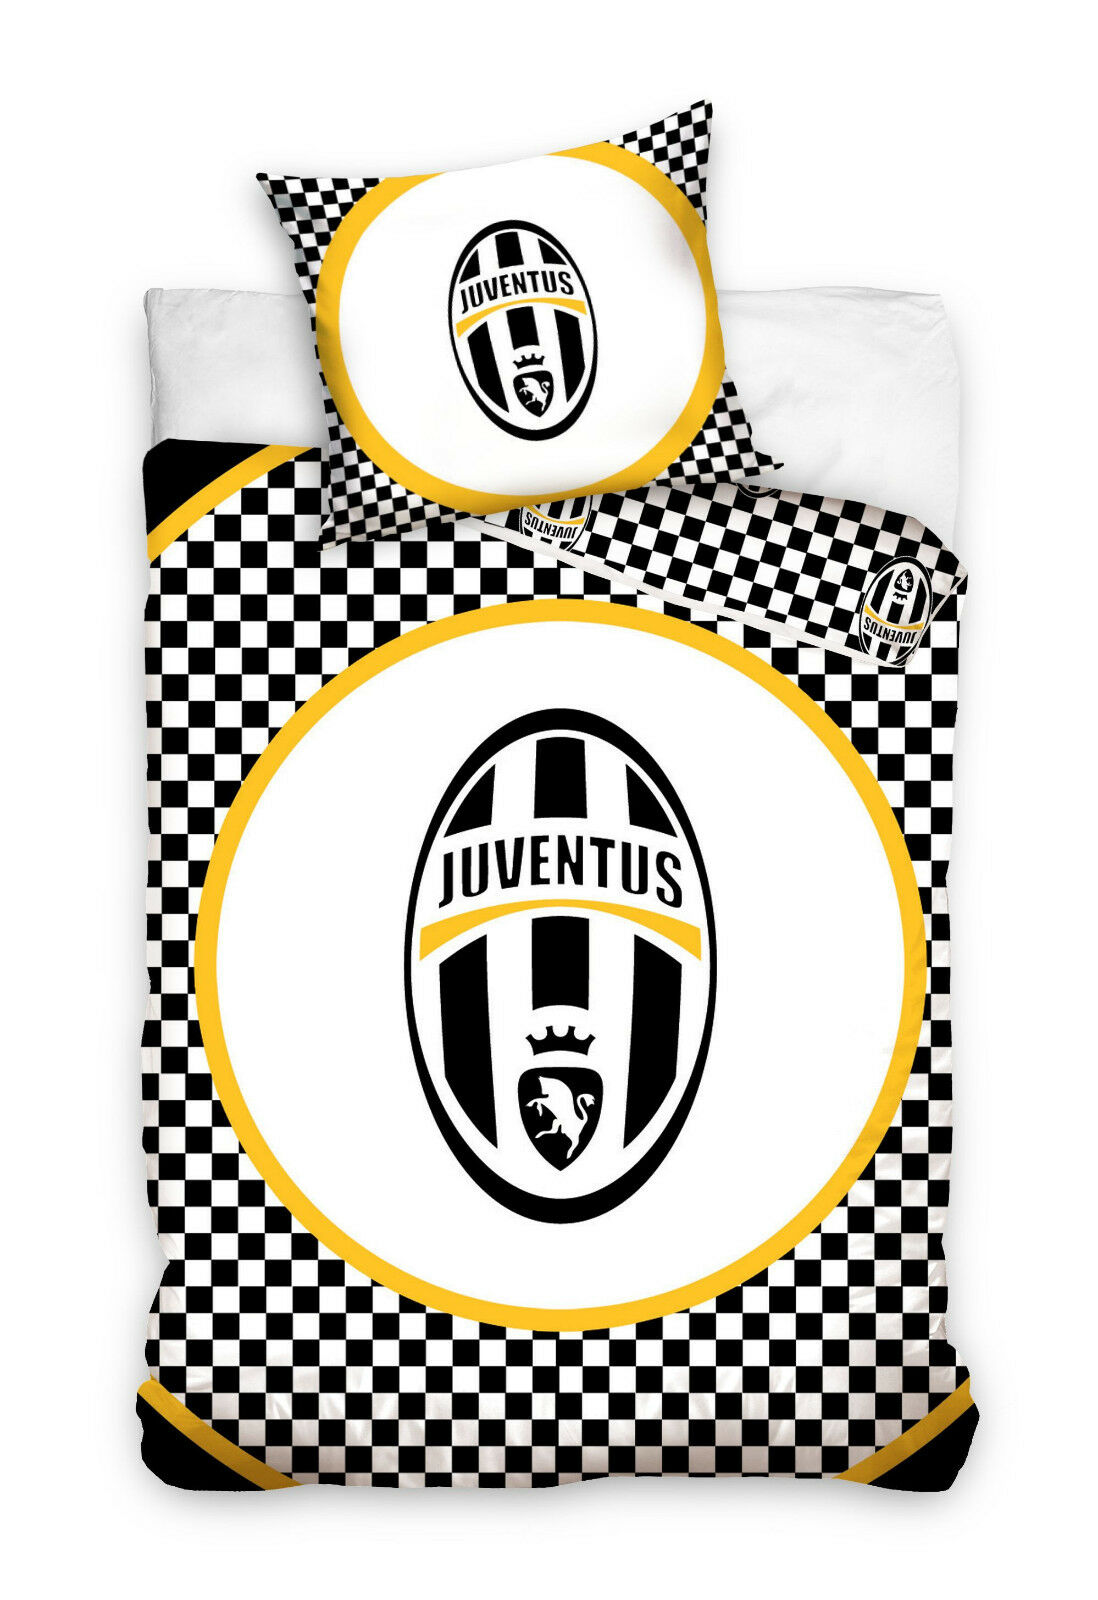 Juventus FC Fußball Bettwäsche Juventus Turin Turin Turin Football Club Bed Linen | Neuankömmling  a1856a